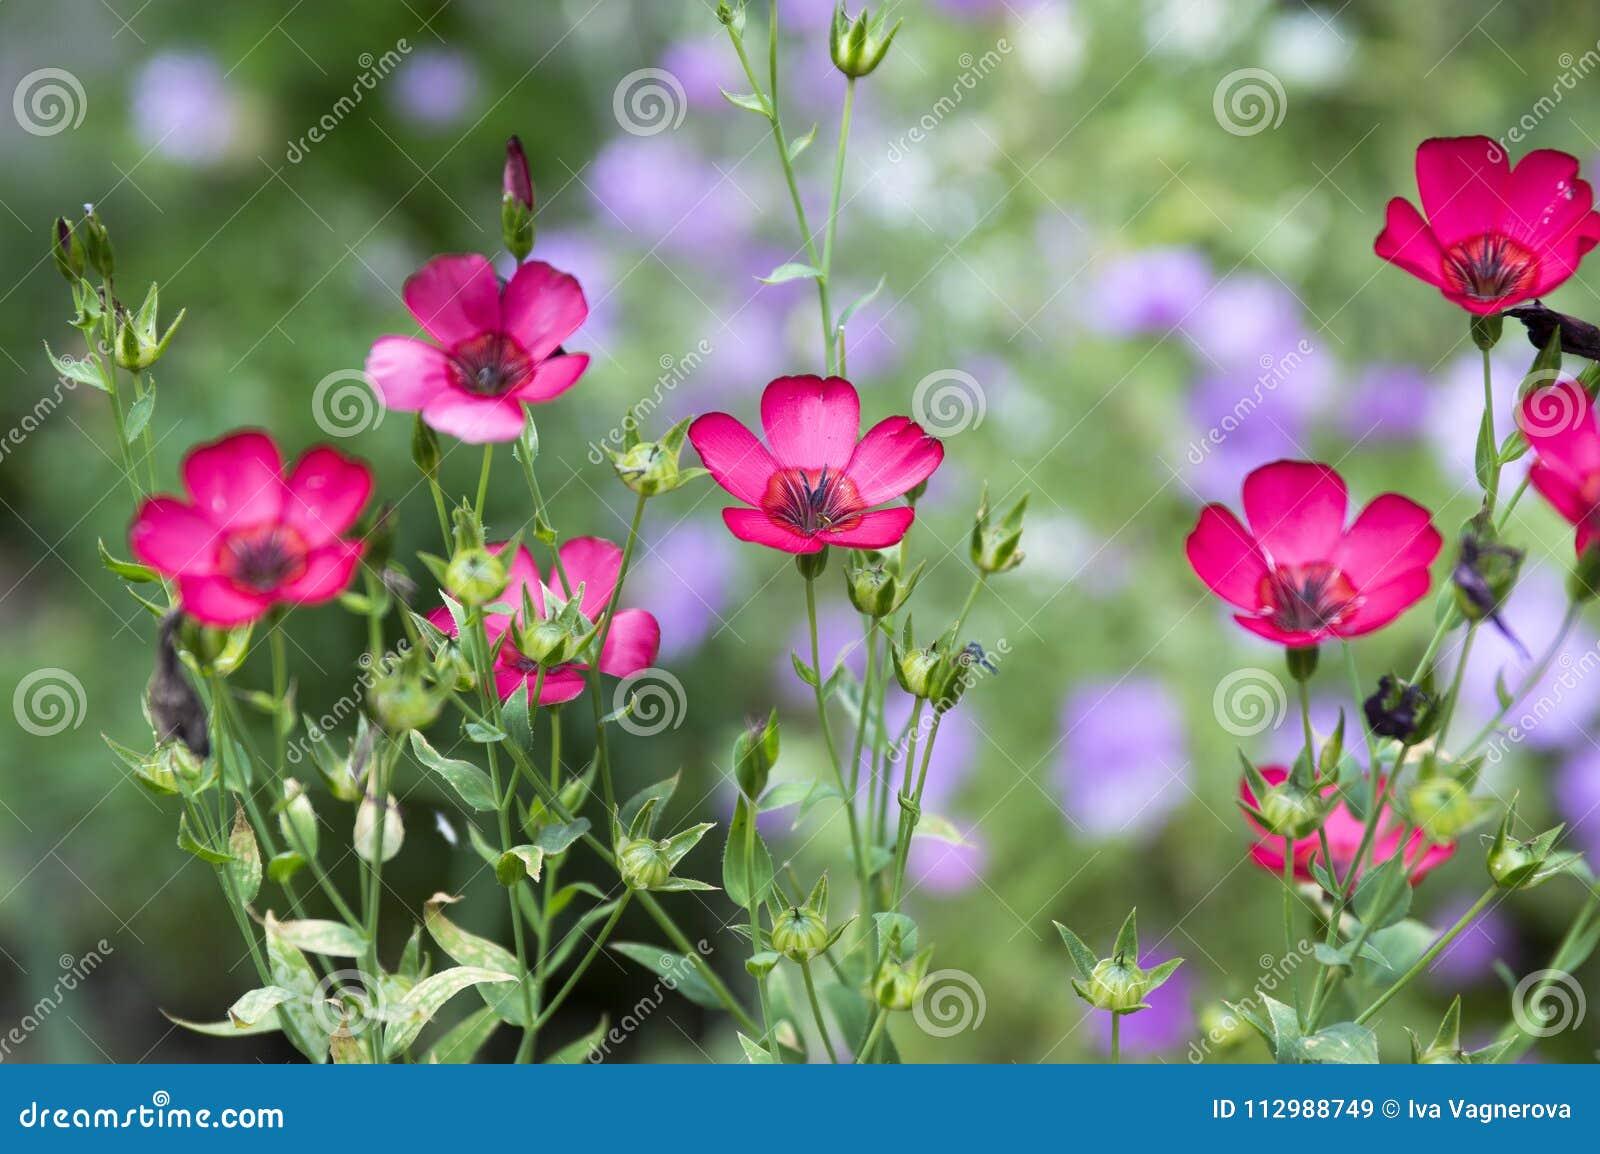 Linum grandiflorum purple flowering plant